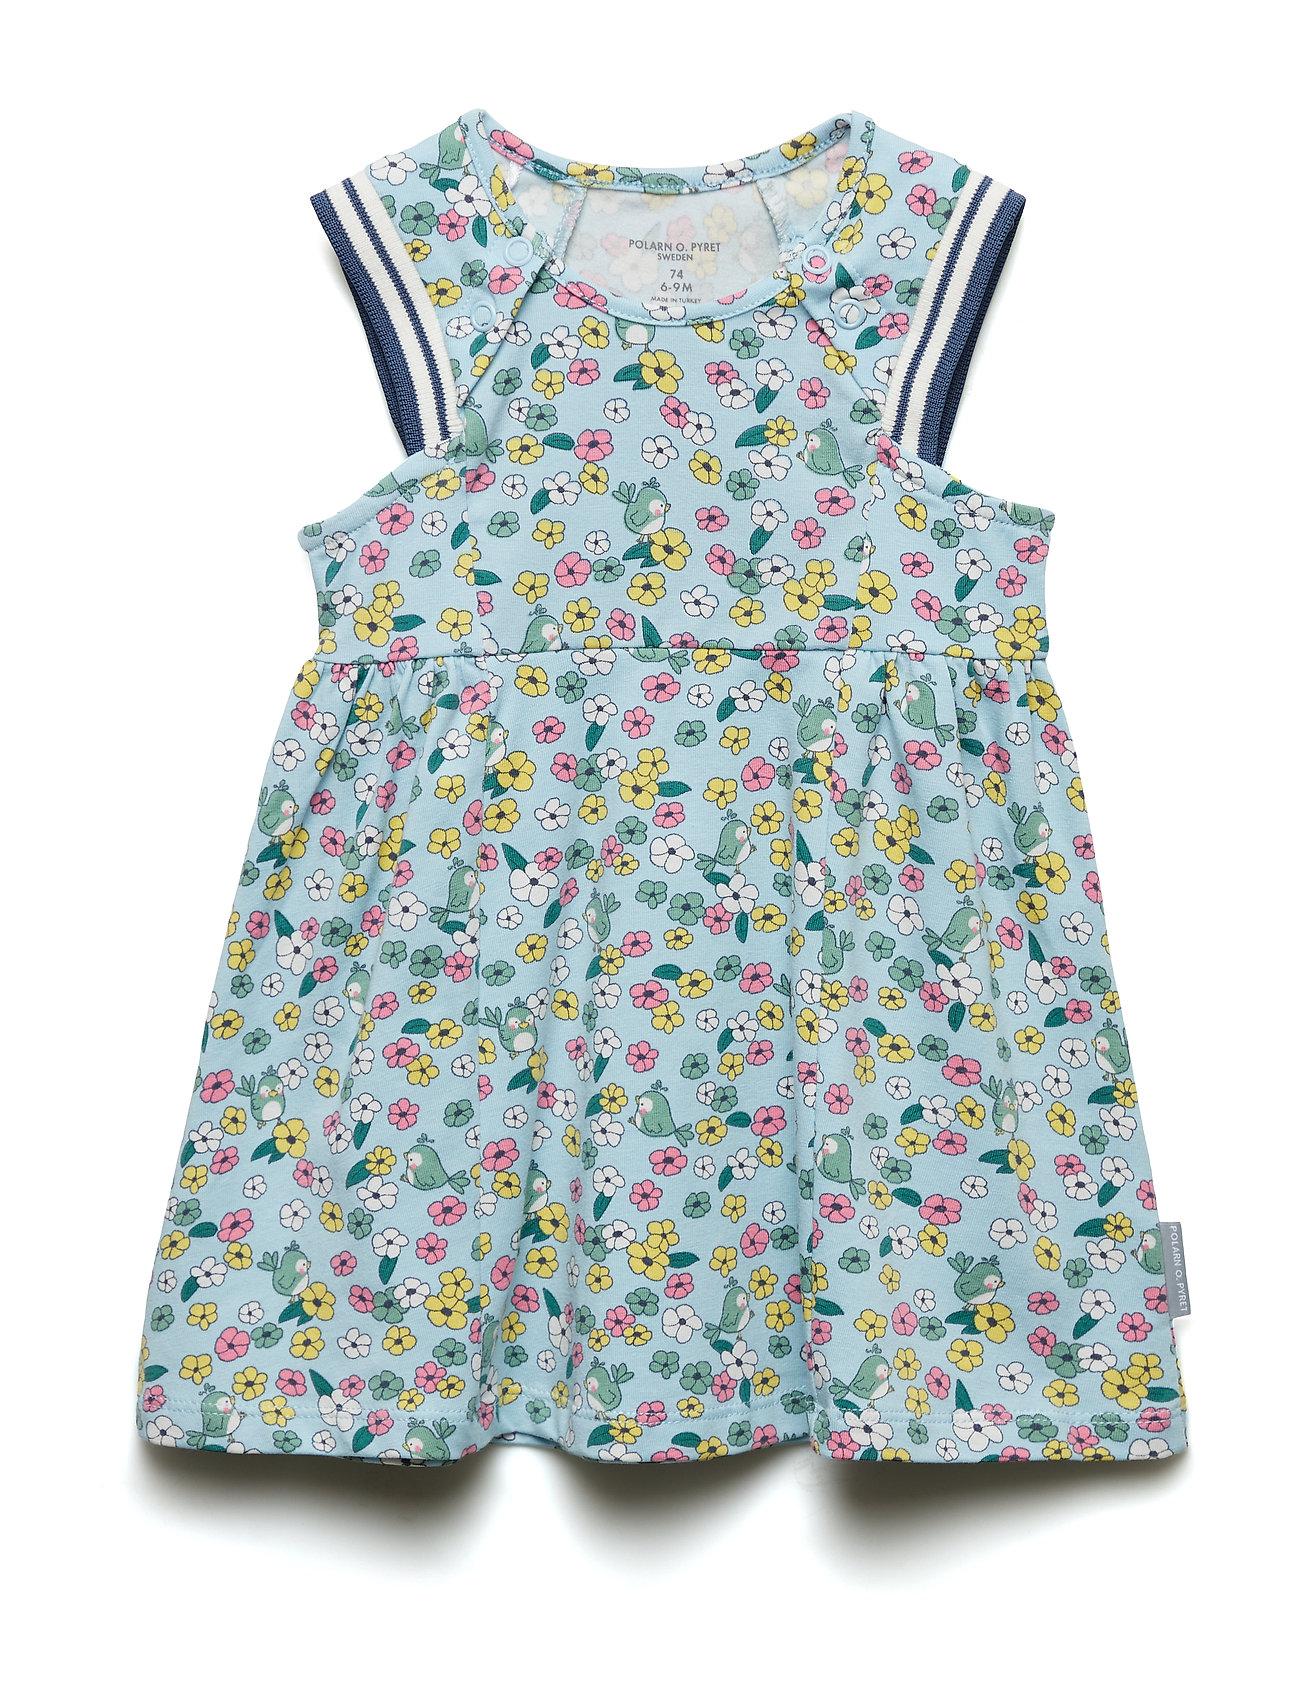 Polarn O. Pyret Dress S/S AOP Baby